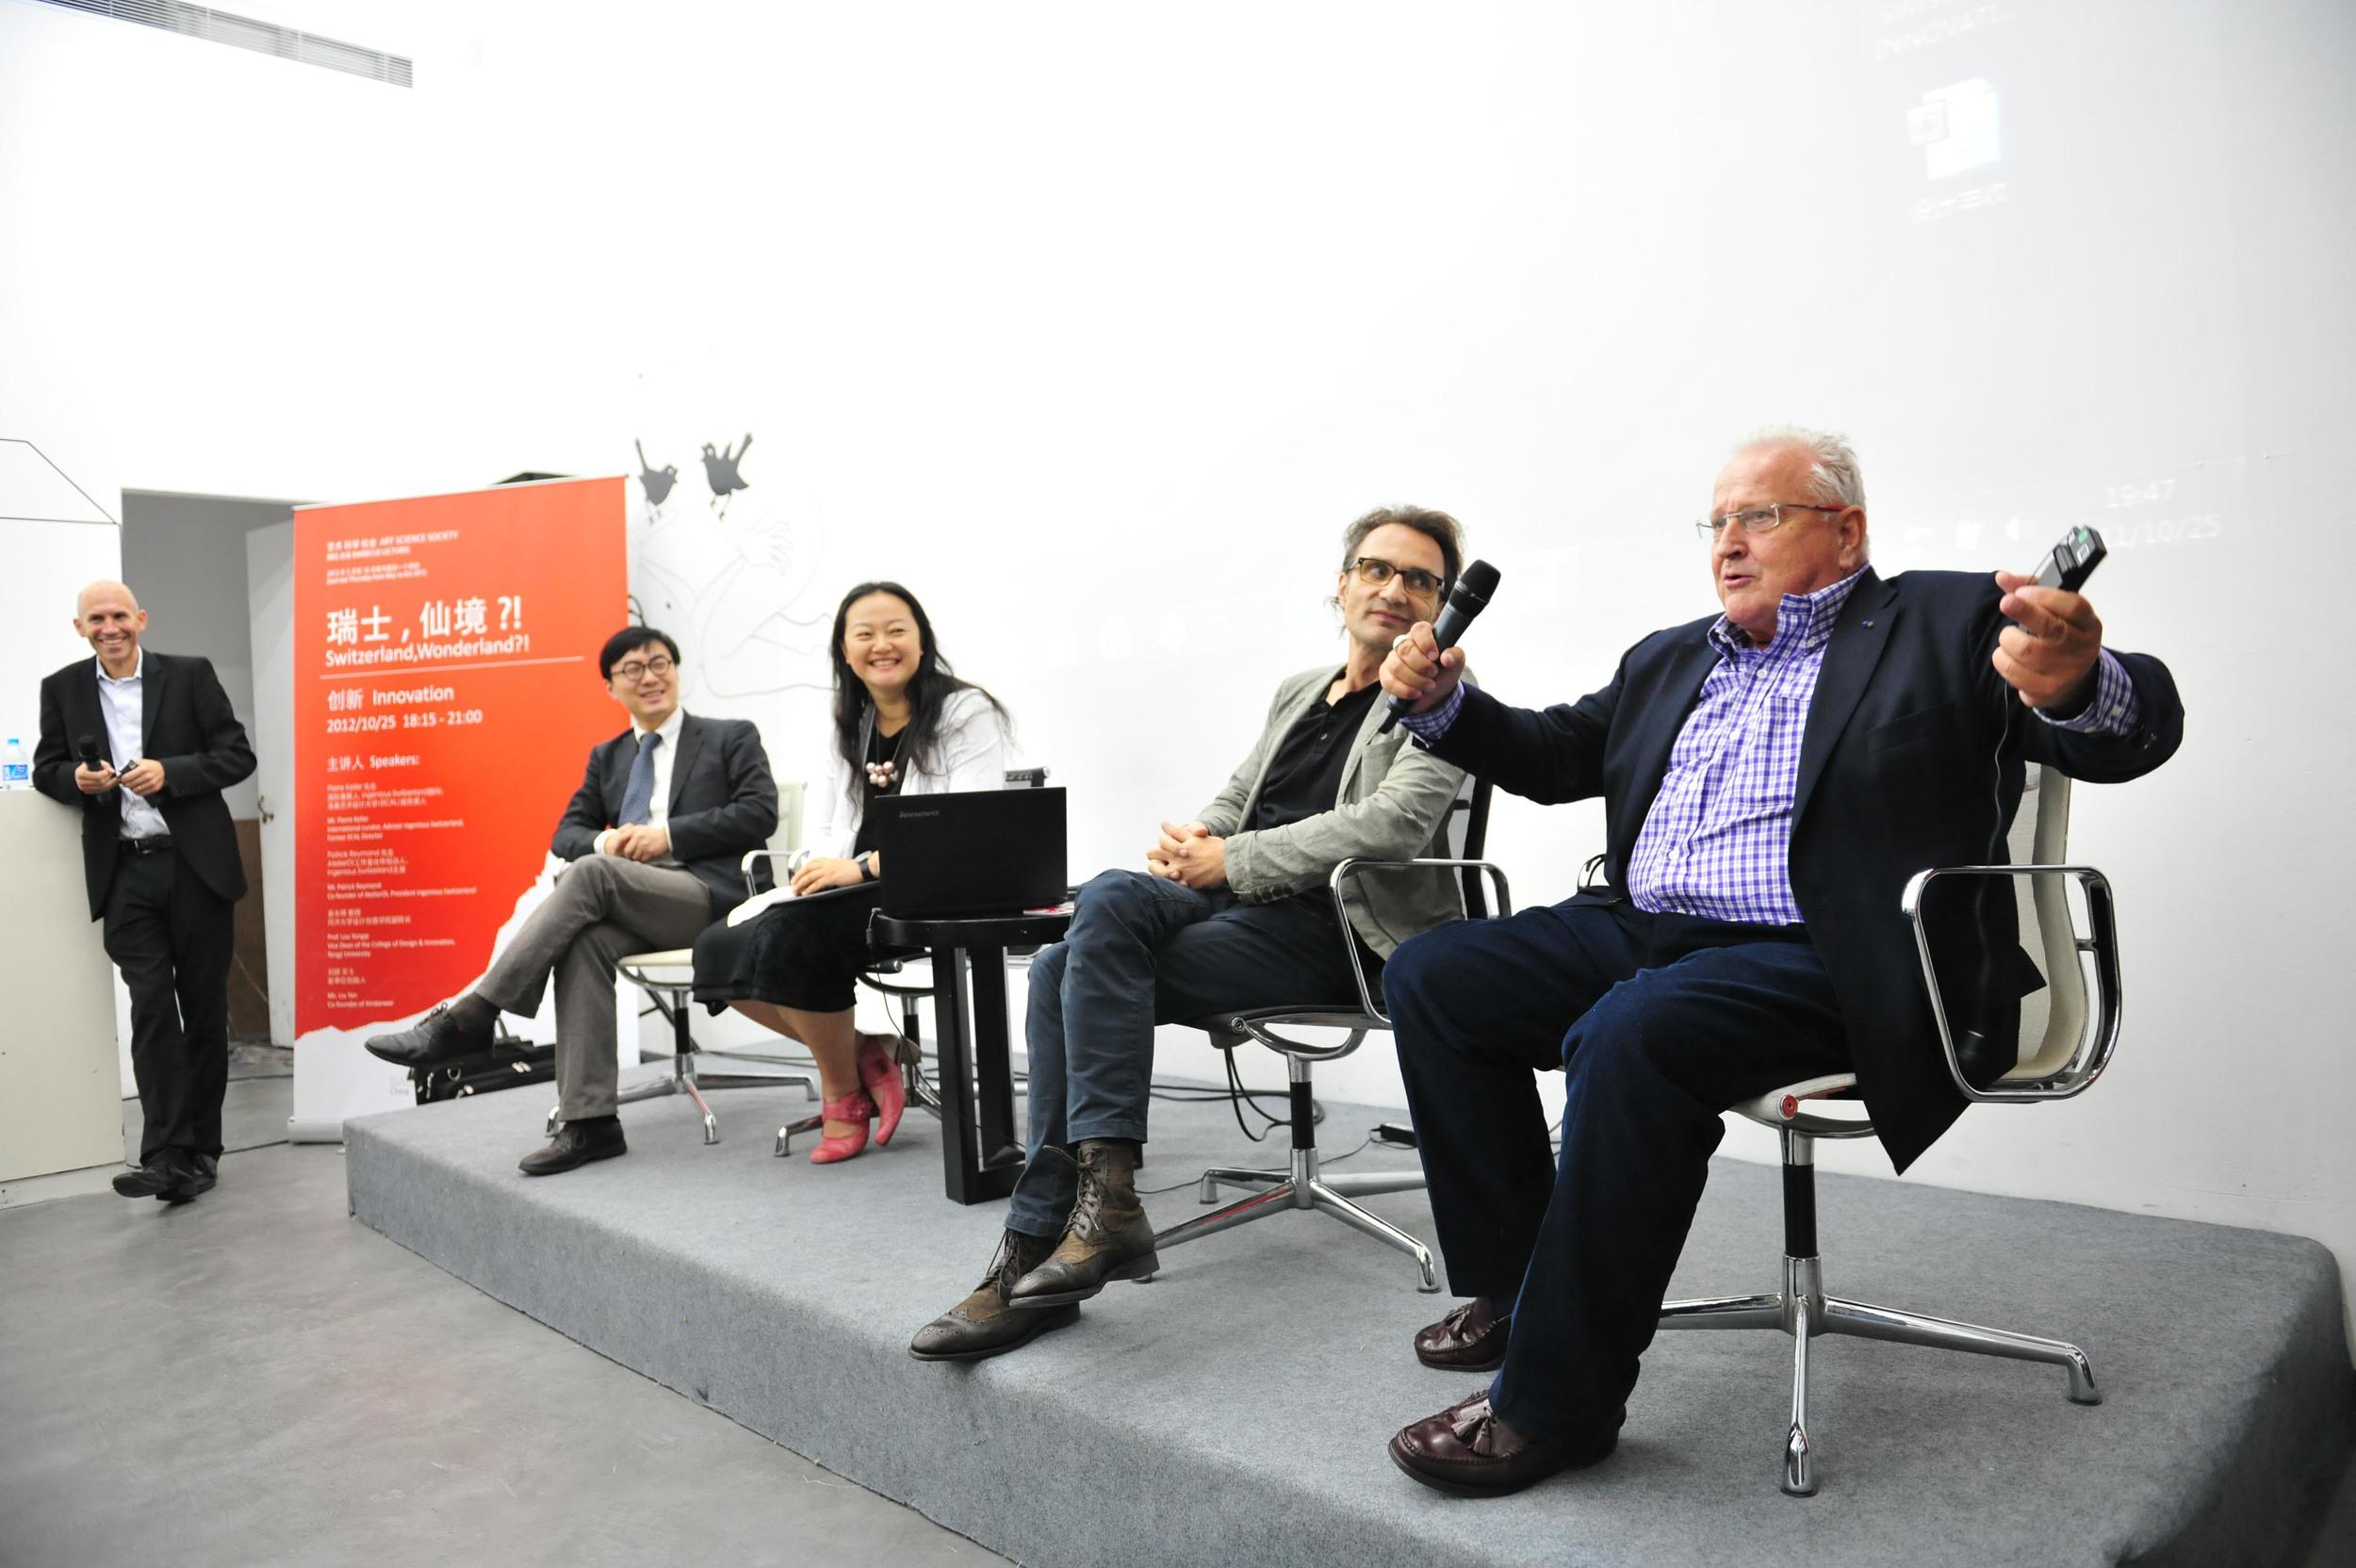 (L-R) Executive Director of swissnex China Pascal Marmier,Vice Dean of the College of Design & InnovationTongji University Prof. Lou Yongqi,Co-founder of XindanweiLiu Yan,Co-founder of AtelierOïPatrick Reymond andFormer ECAL DirectorPierre Keller.